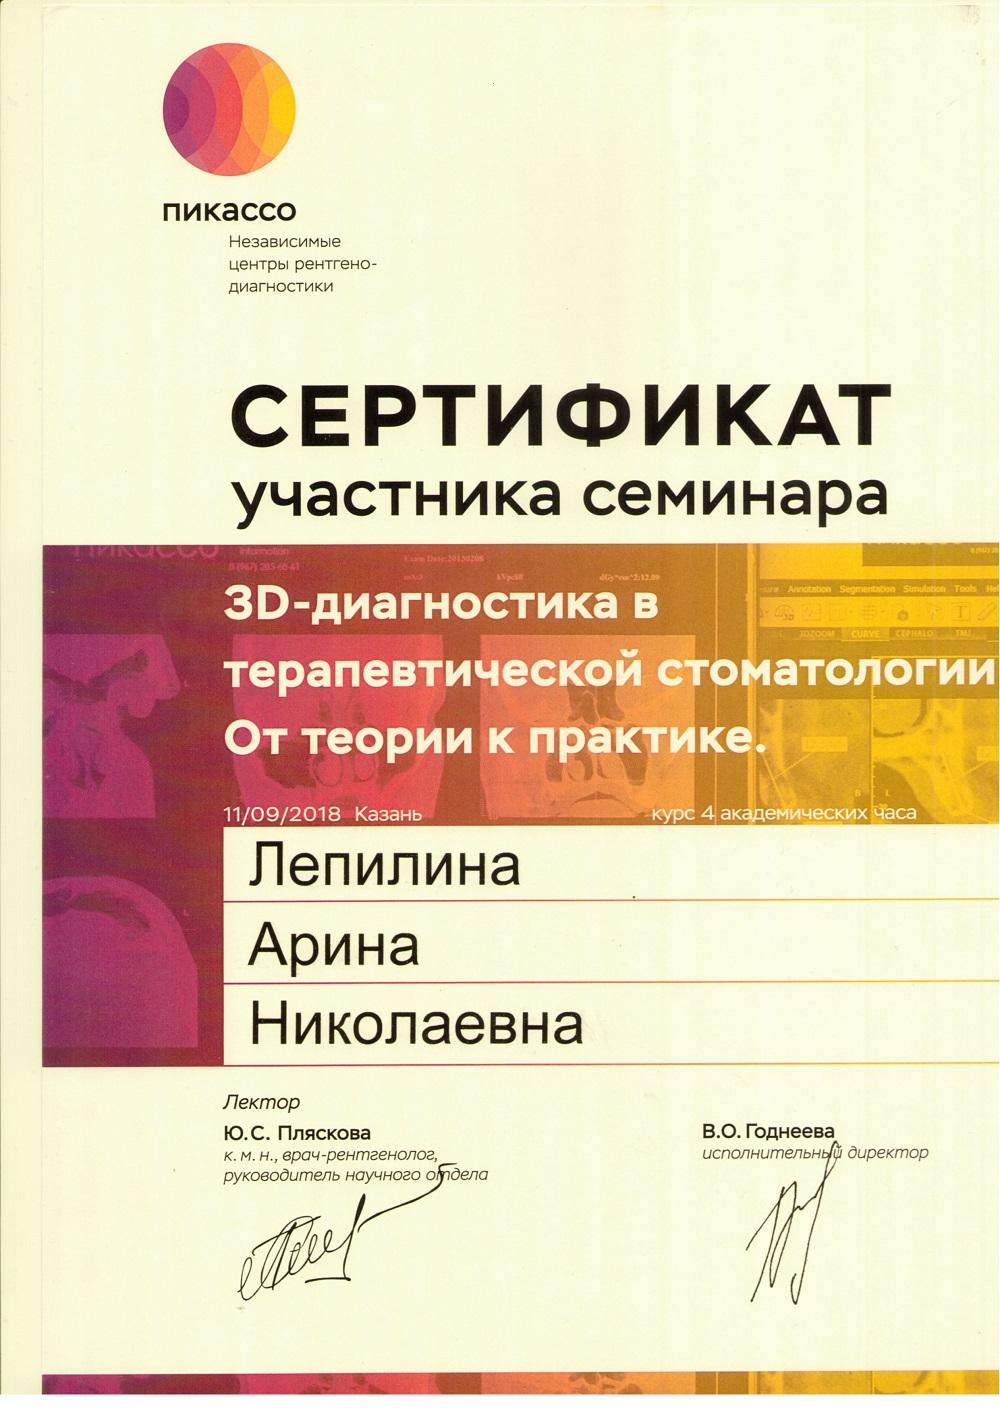 Сертификат участника семинара 3D